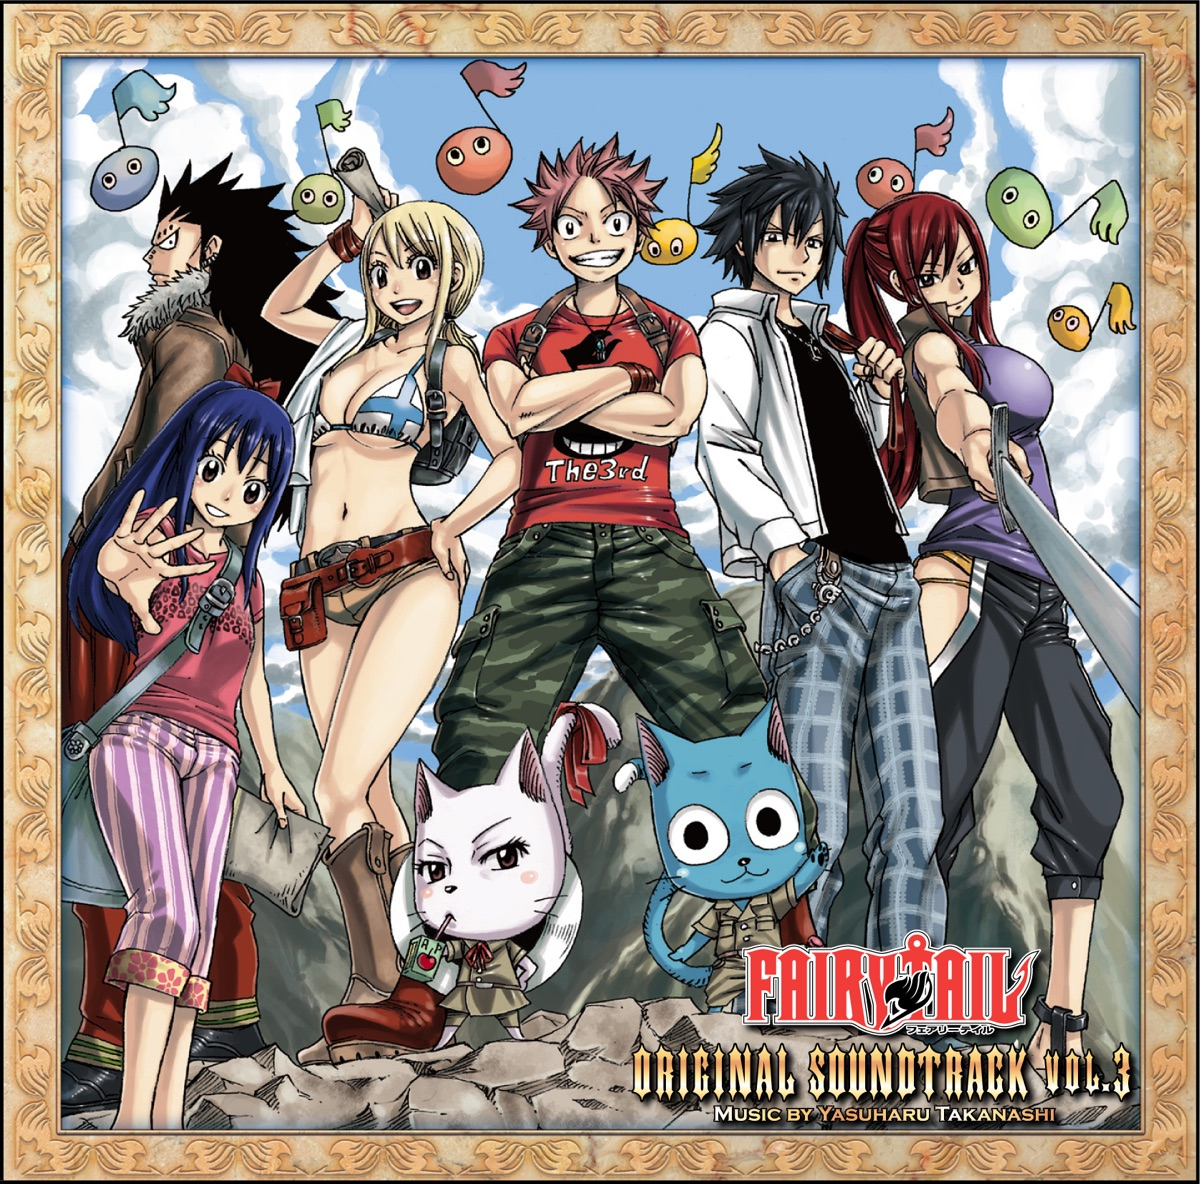 Tv anime fairy tail origianl soundtrack vol